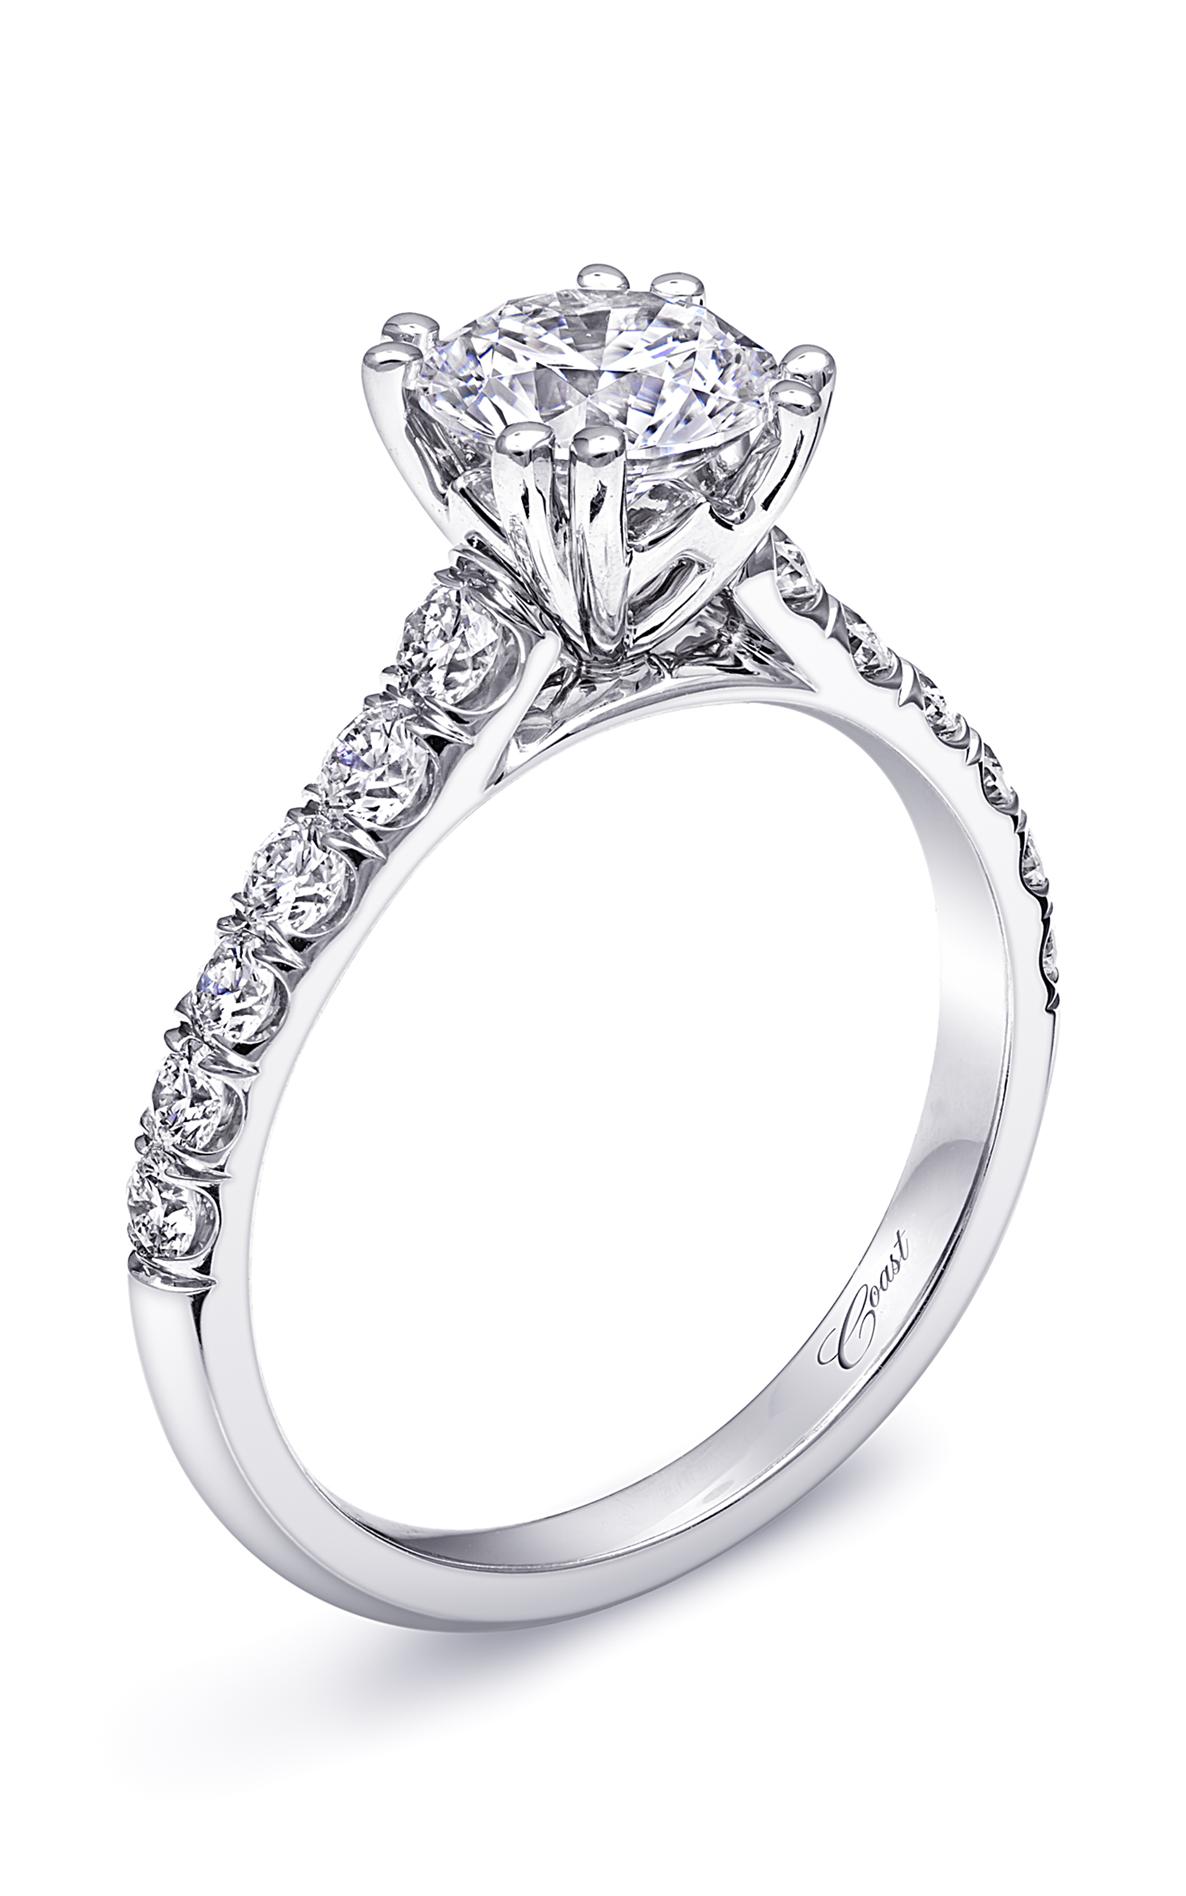 Coast Diamond Charisma LS10136 product image